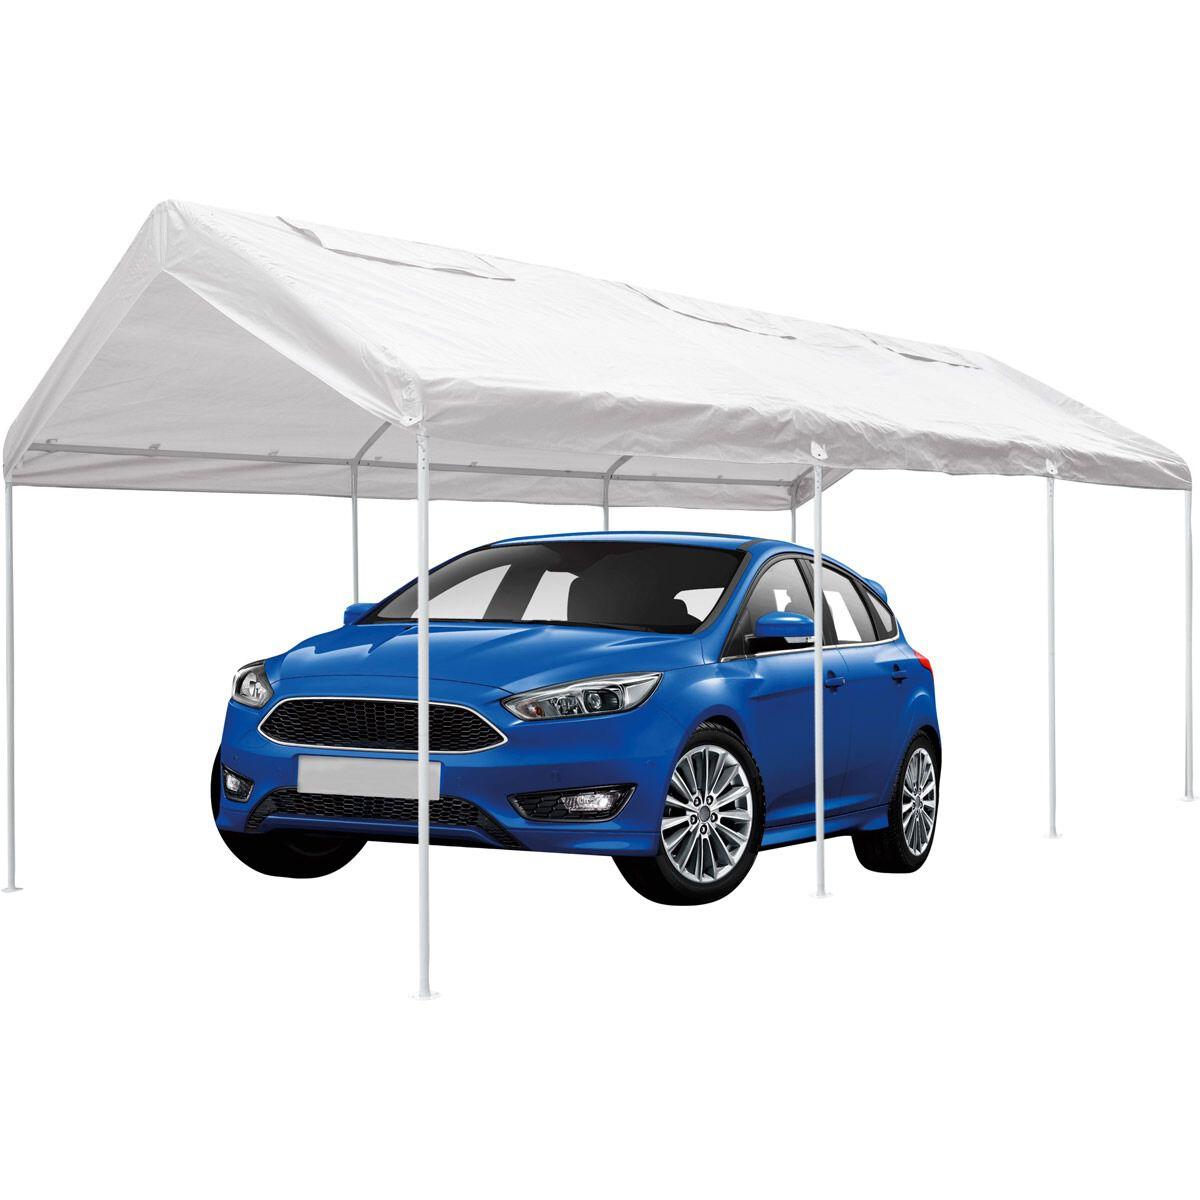 coverall temporary carport 3 x 6 x 2 7m supercheap auto new zealand rh supercheapauto co nz